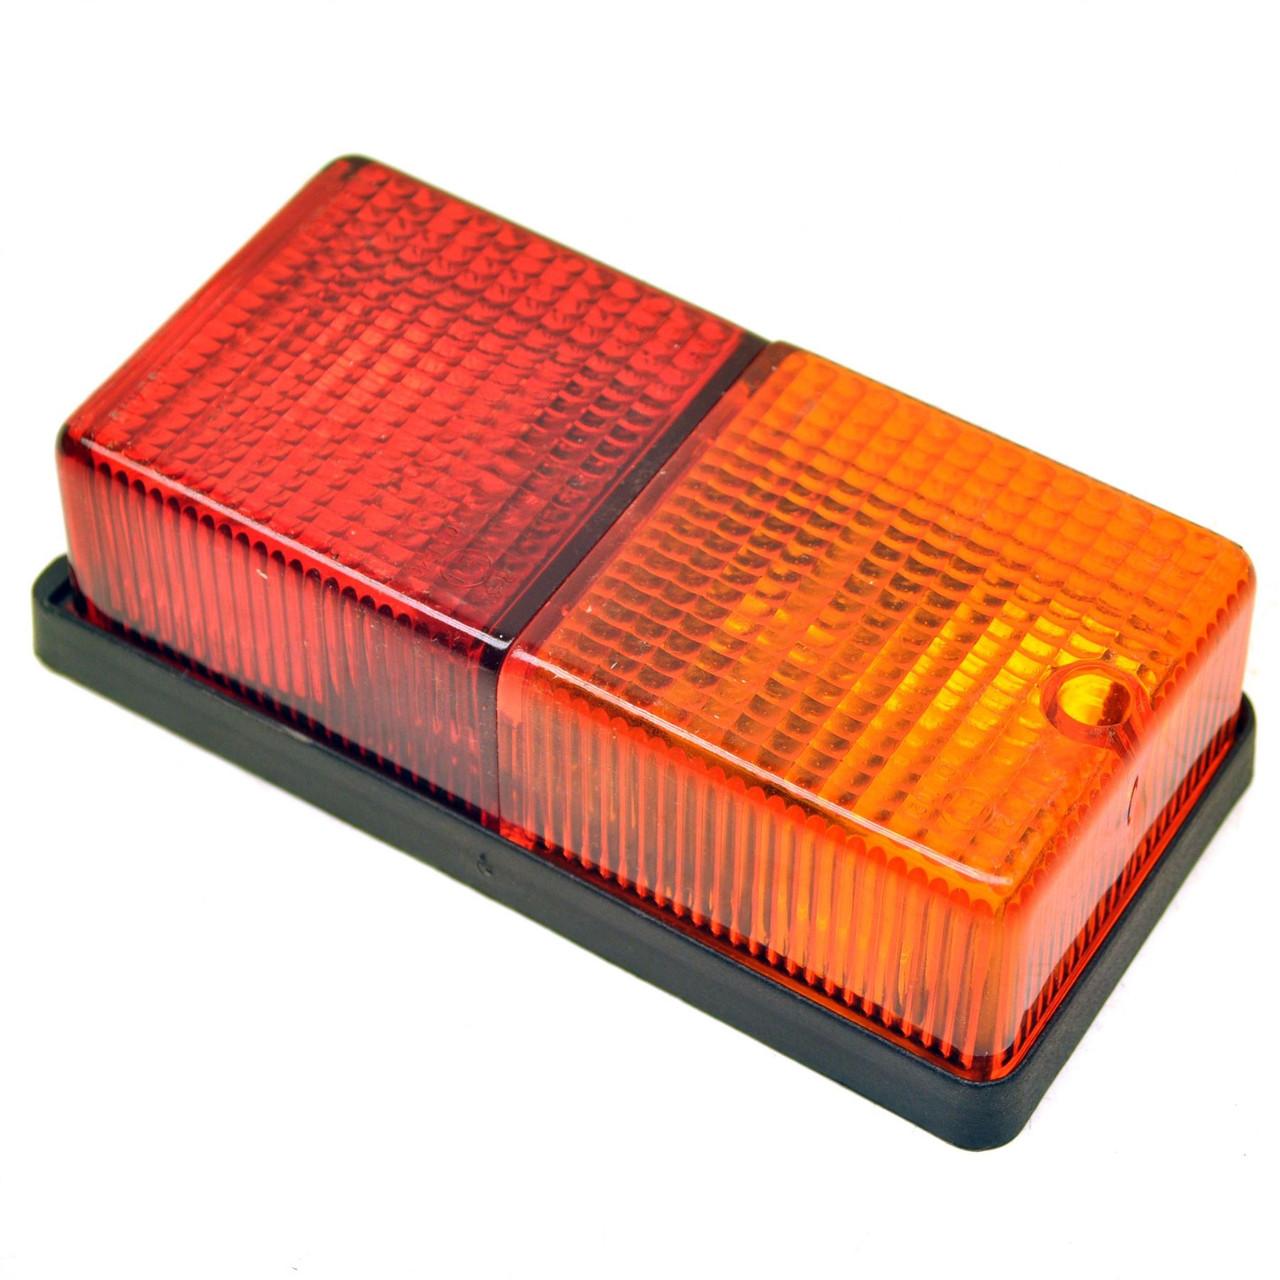 4 Function Rear Trailer Light / Lamp Electrics Caravan TR143